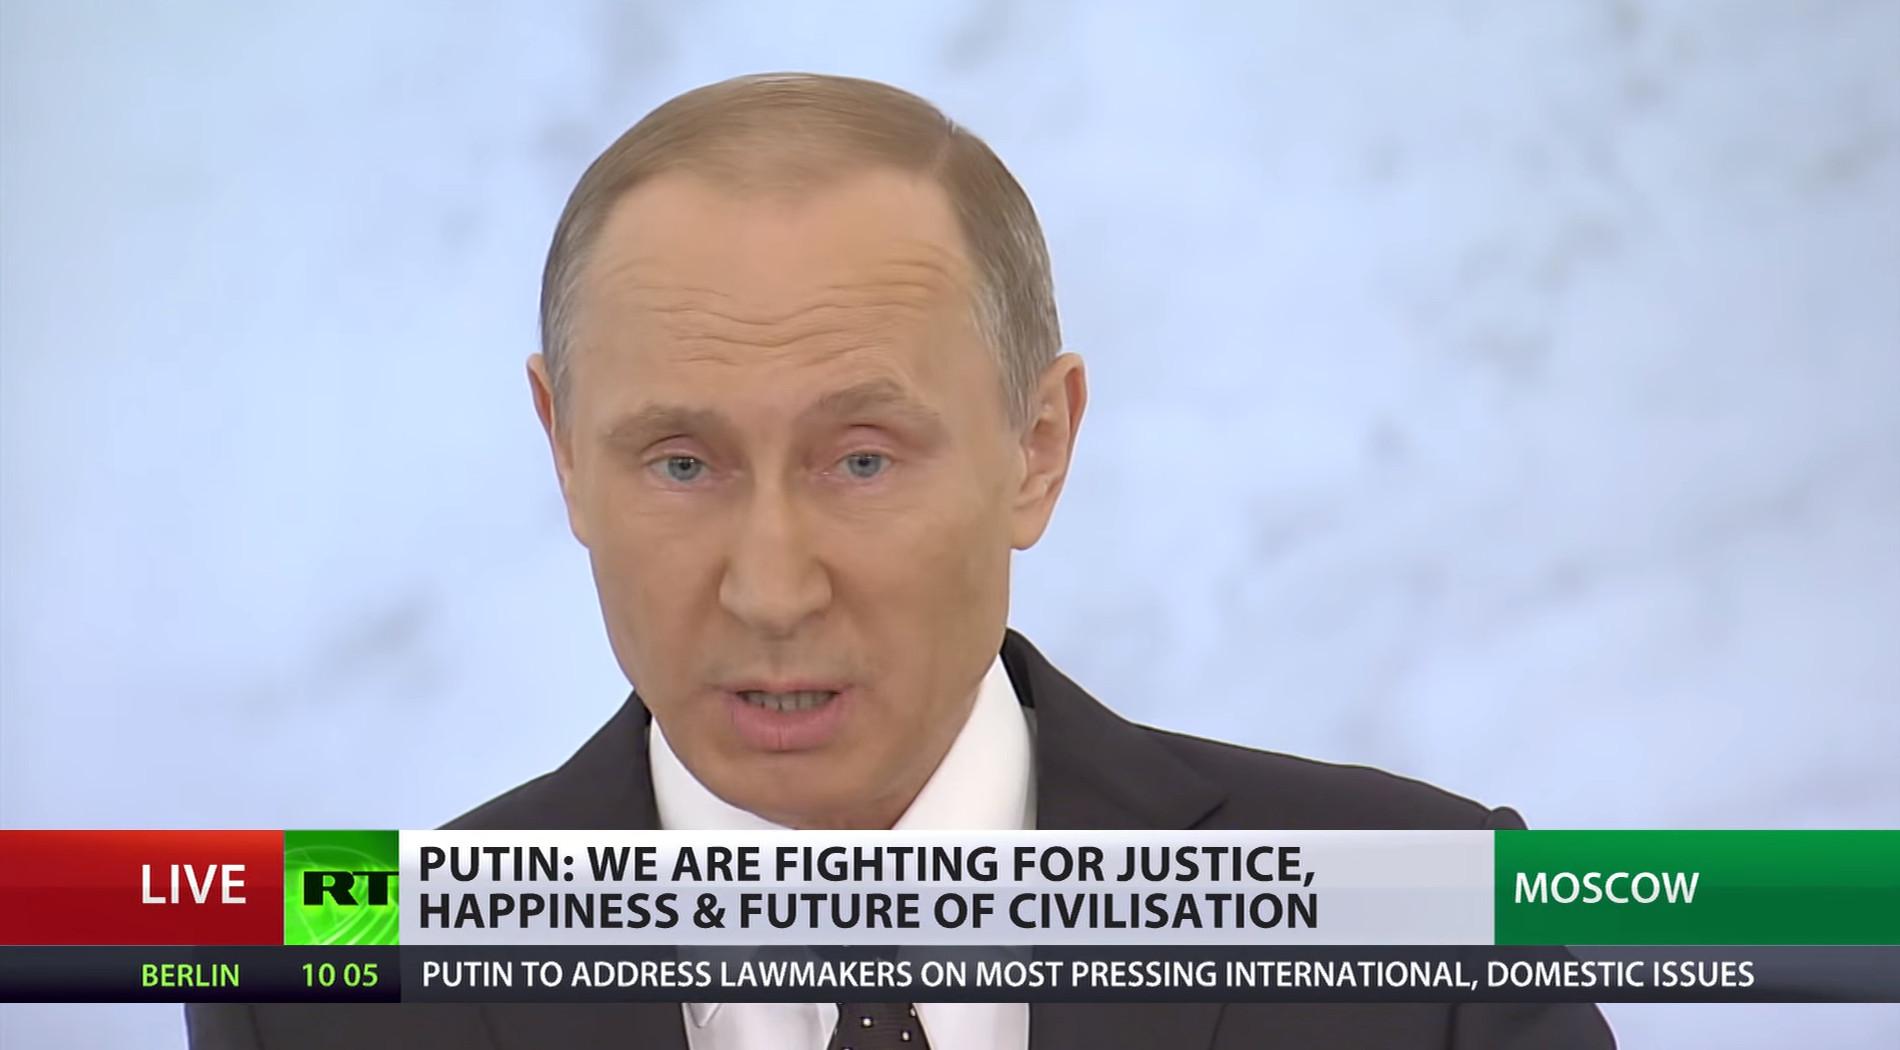 Rysslands president Vladimir Putin. Foto: Youtube/RT